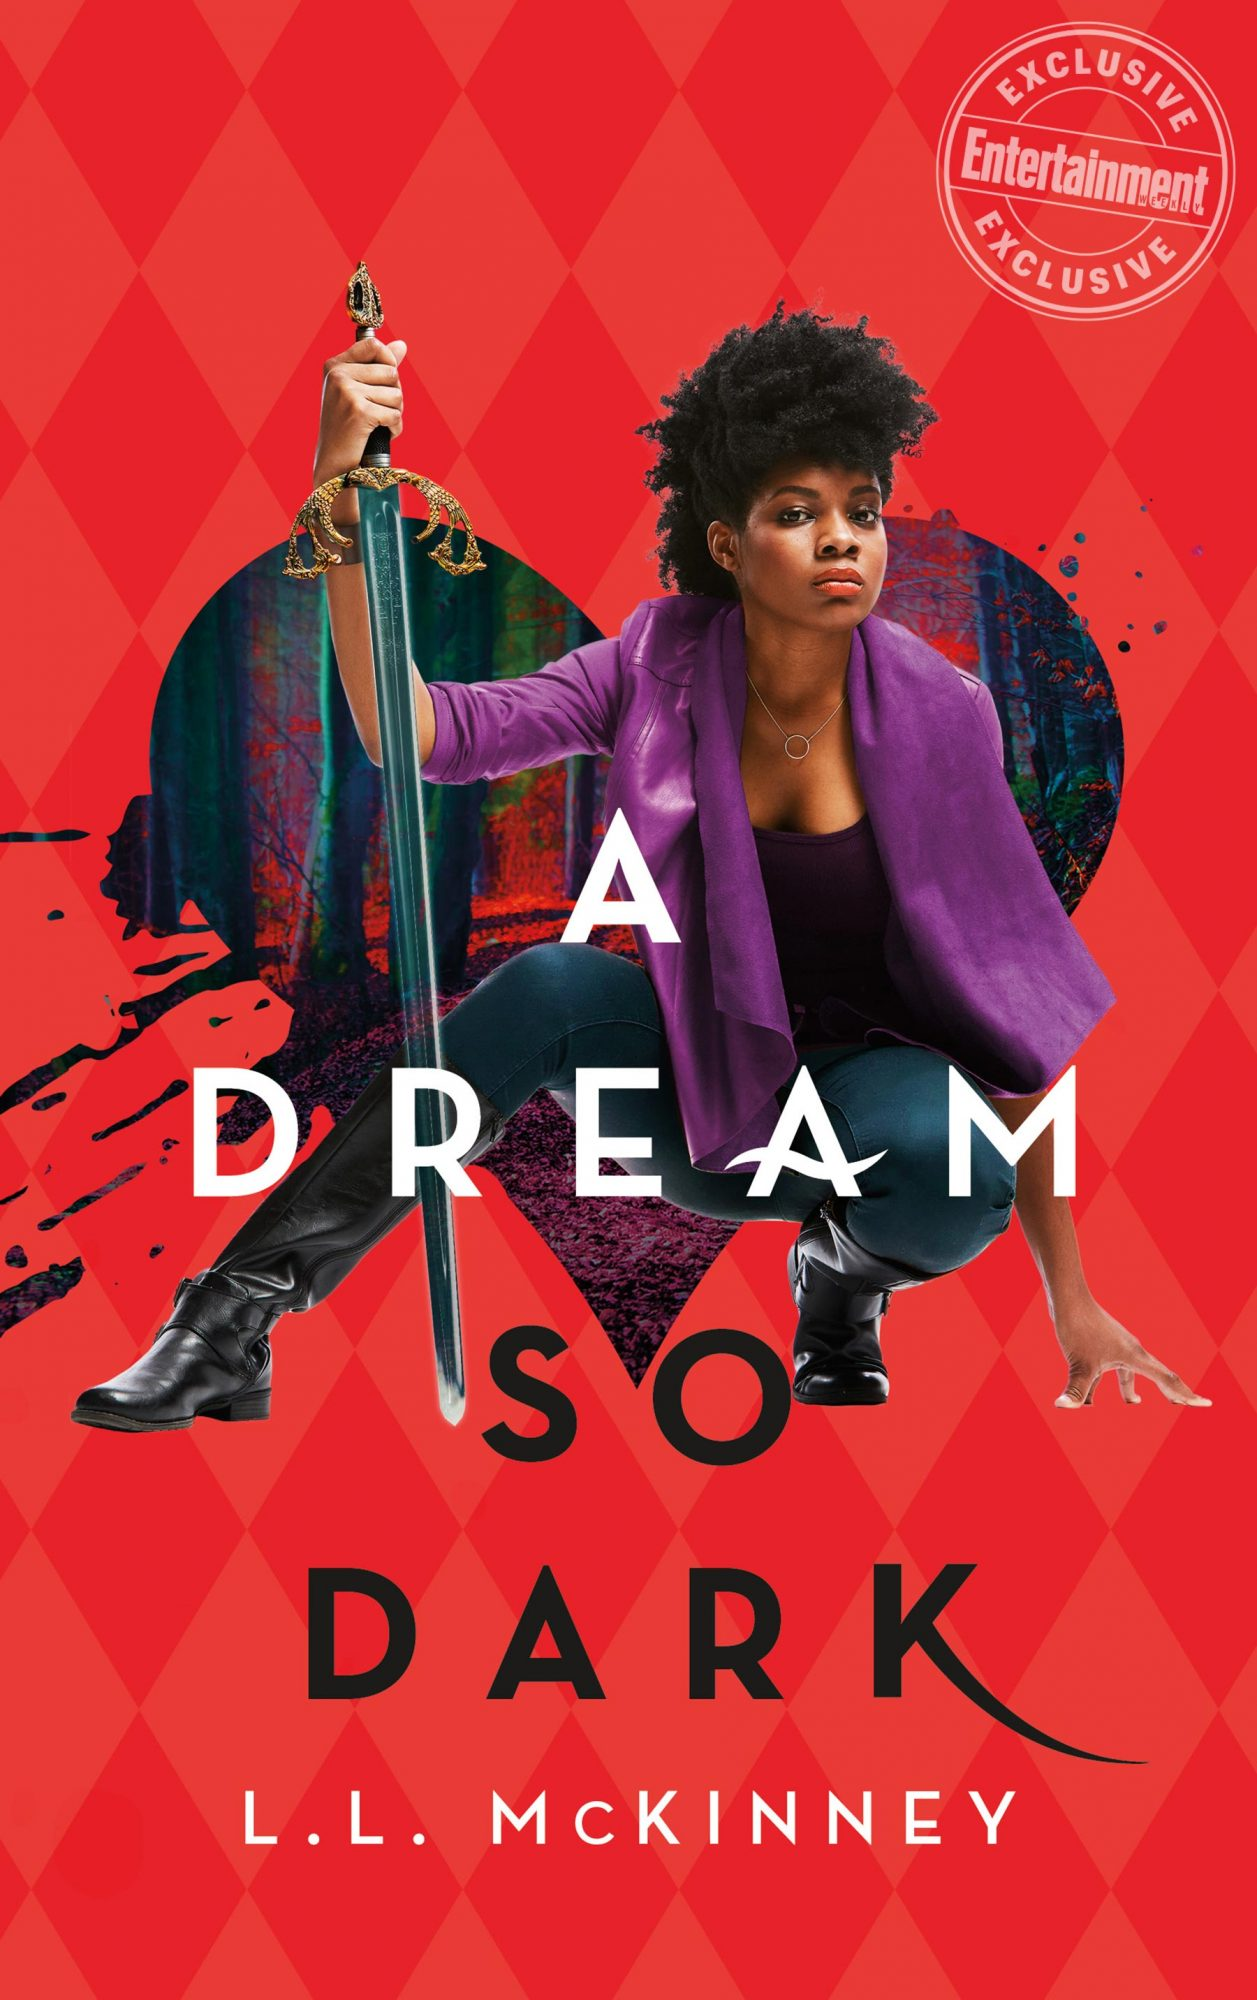 DreamSoDark-Revised-2